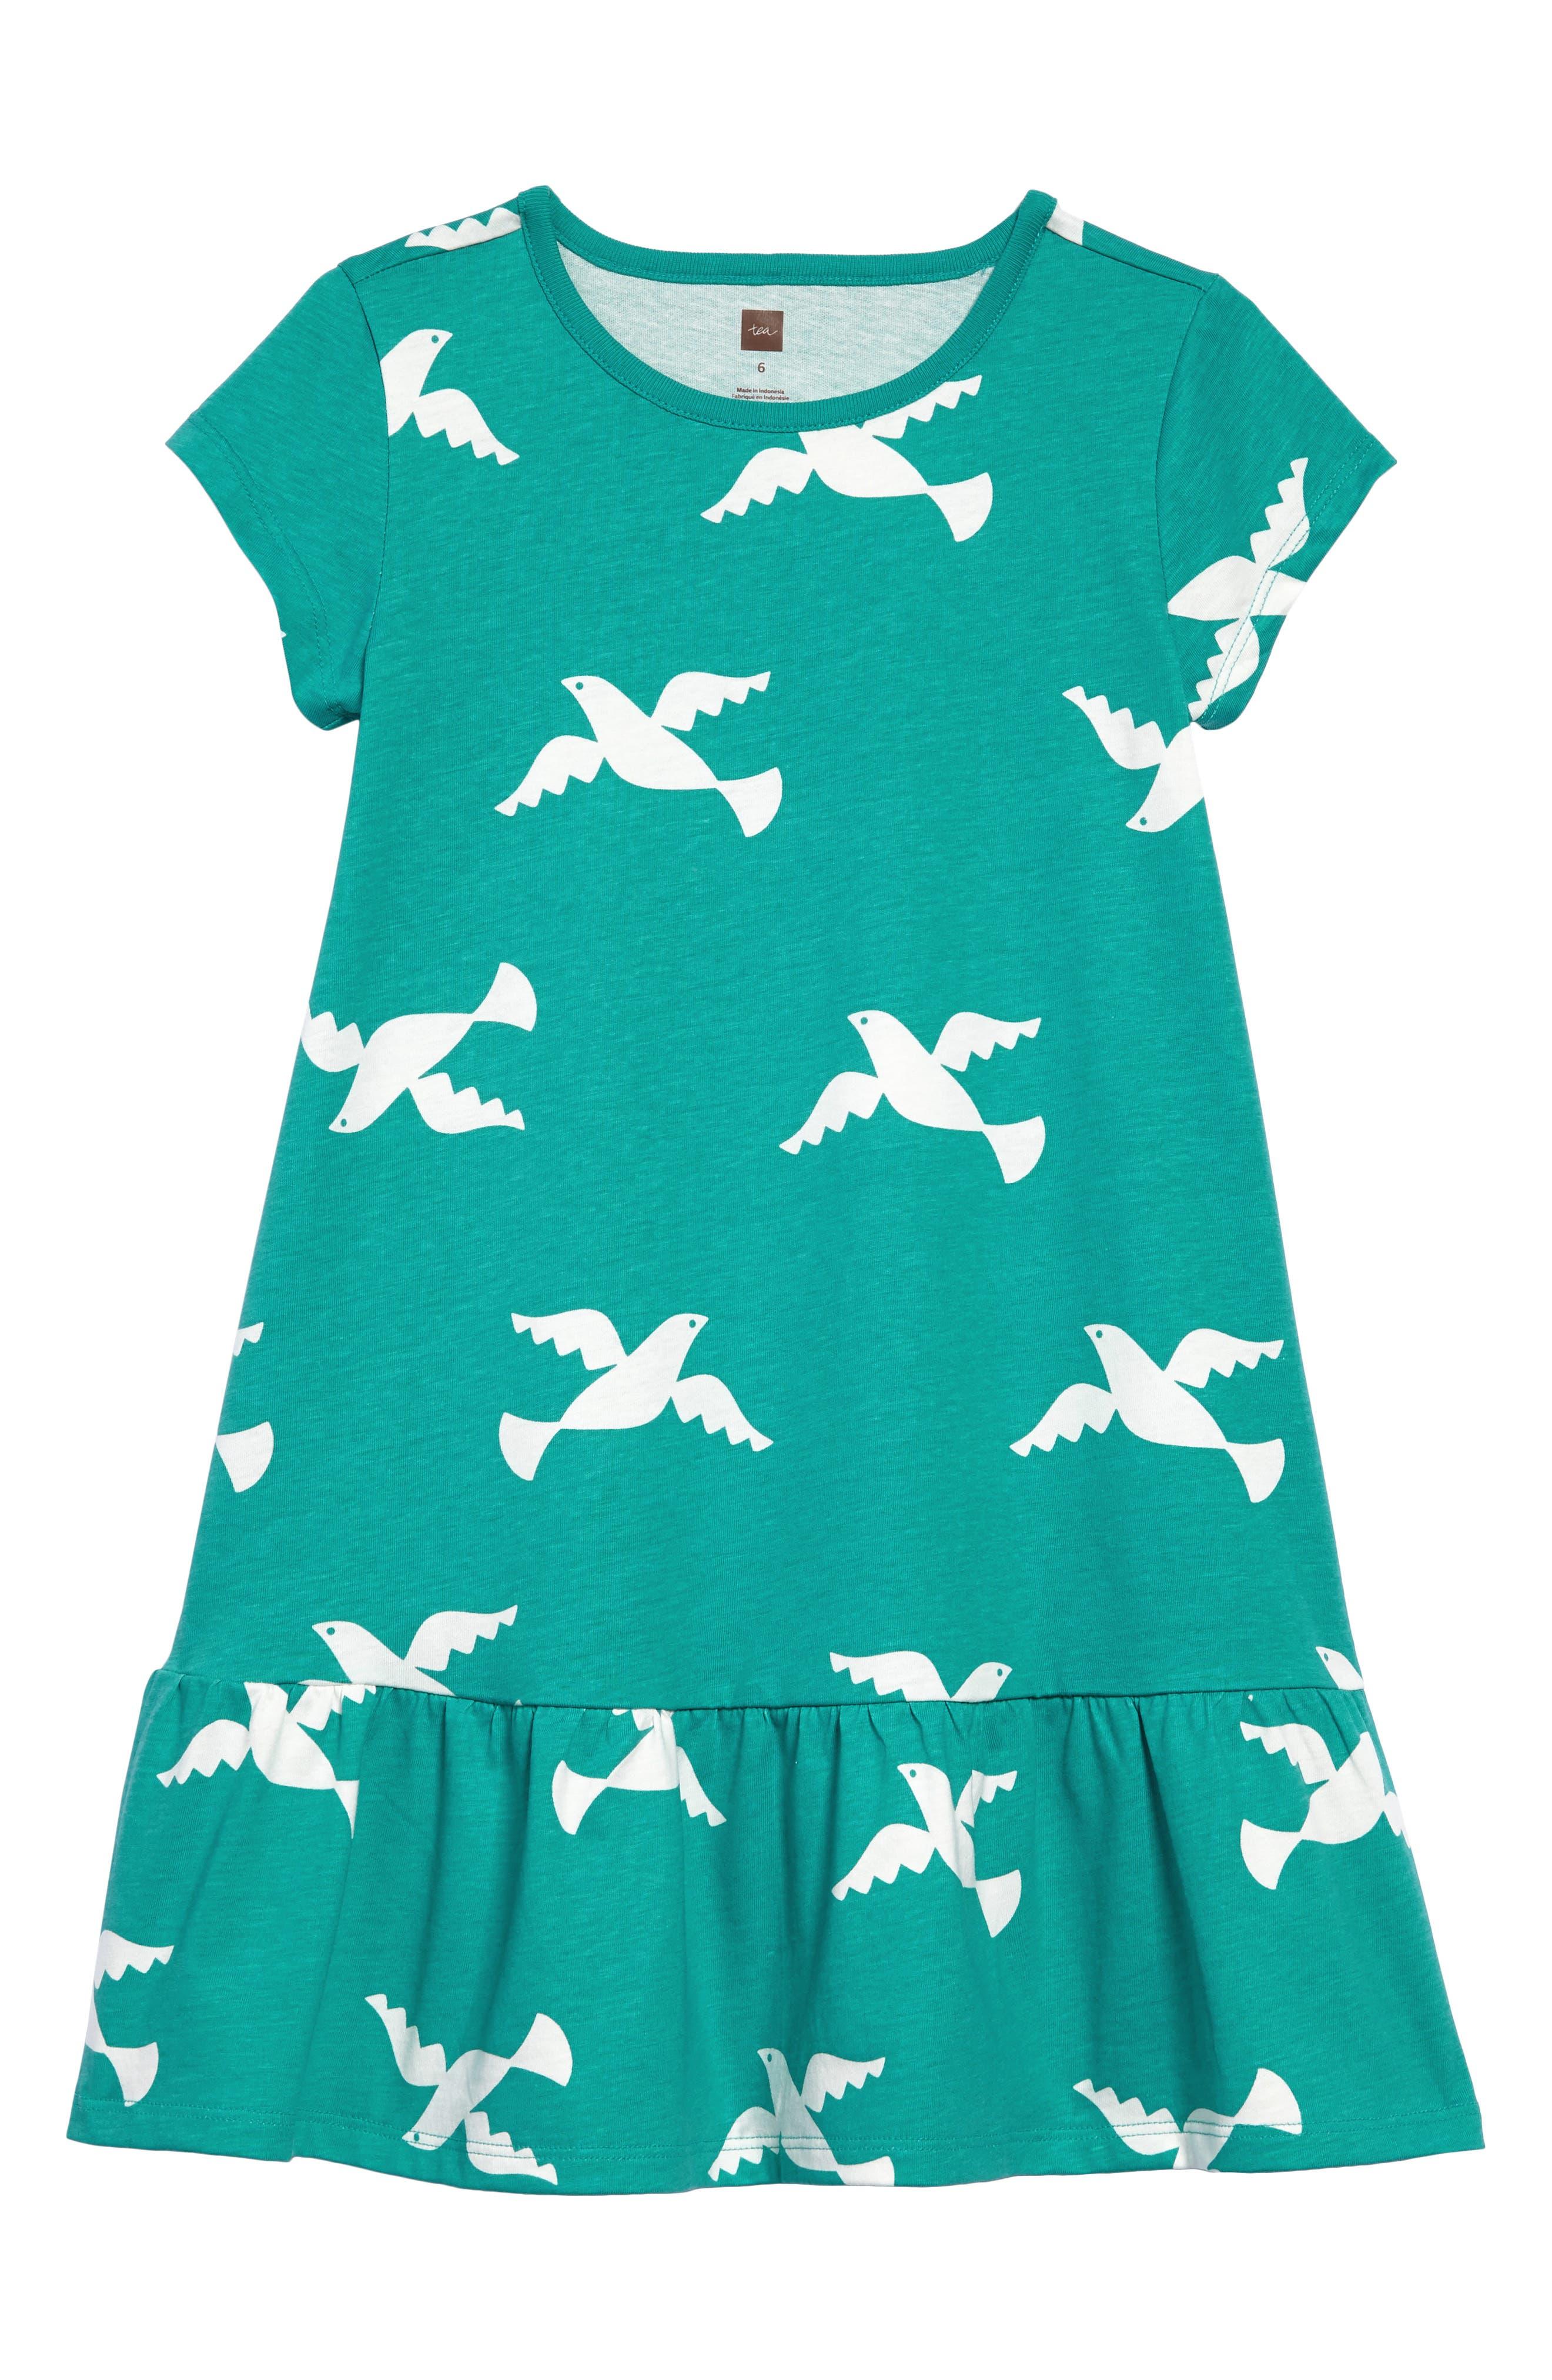 Birds in Flight Ruffle Dress,                             Main thumbnail 1, color,                             401